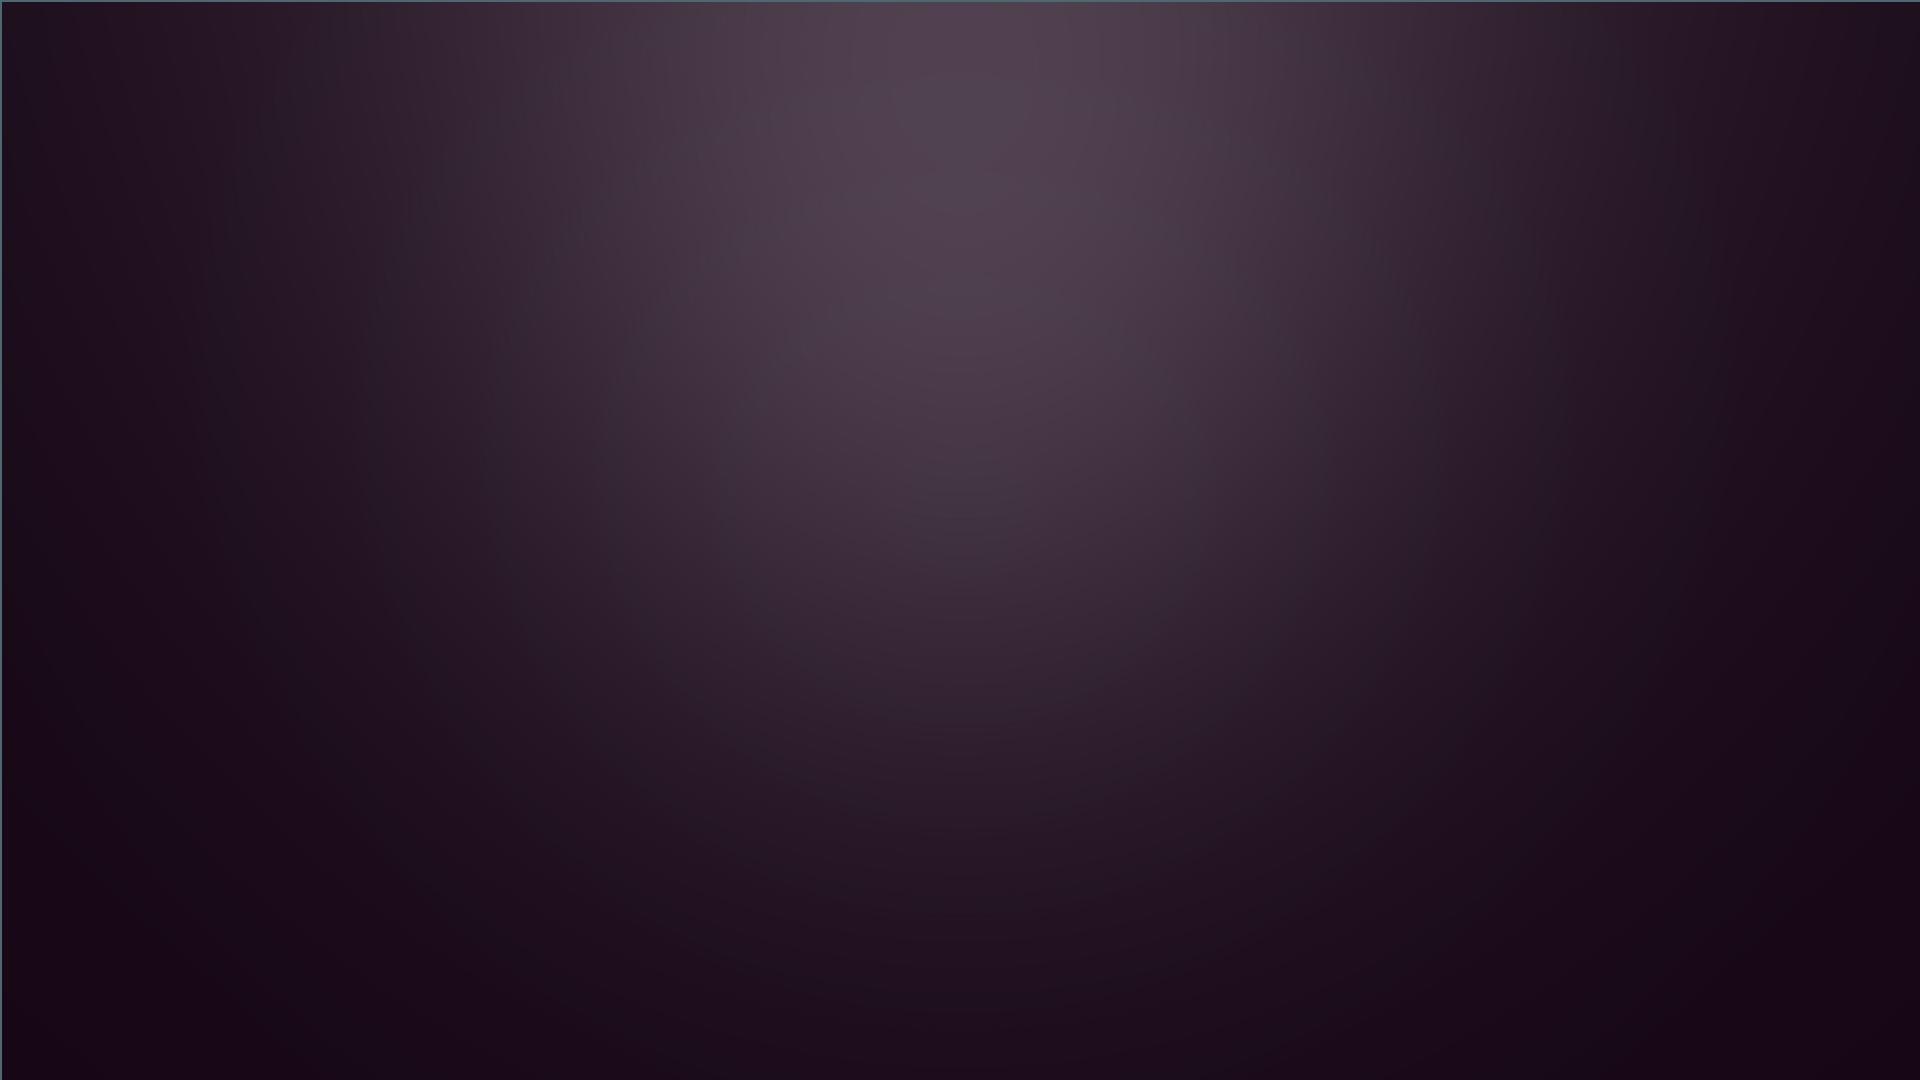 Dark Purple Backgrounds 1920x1080